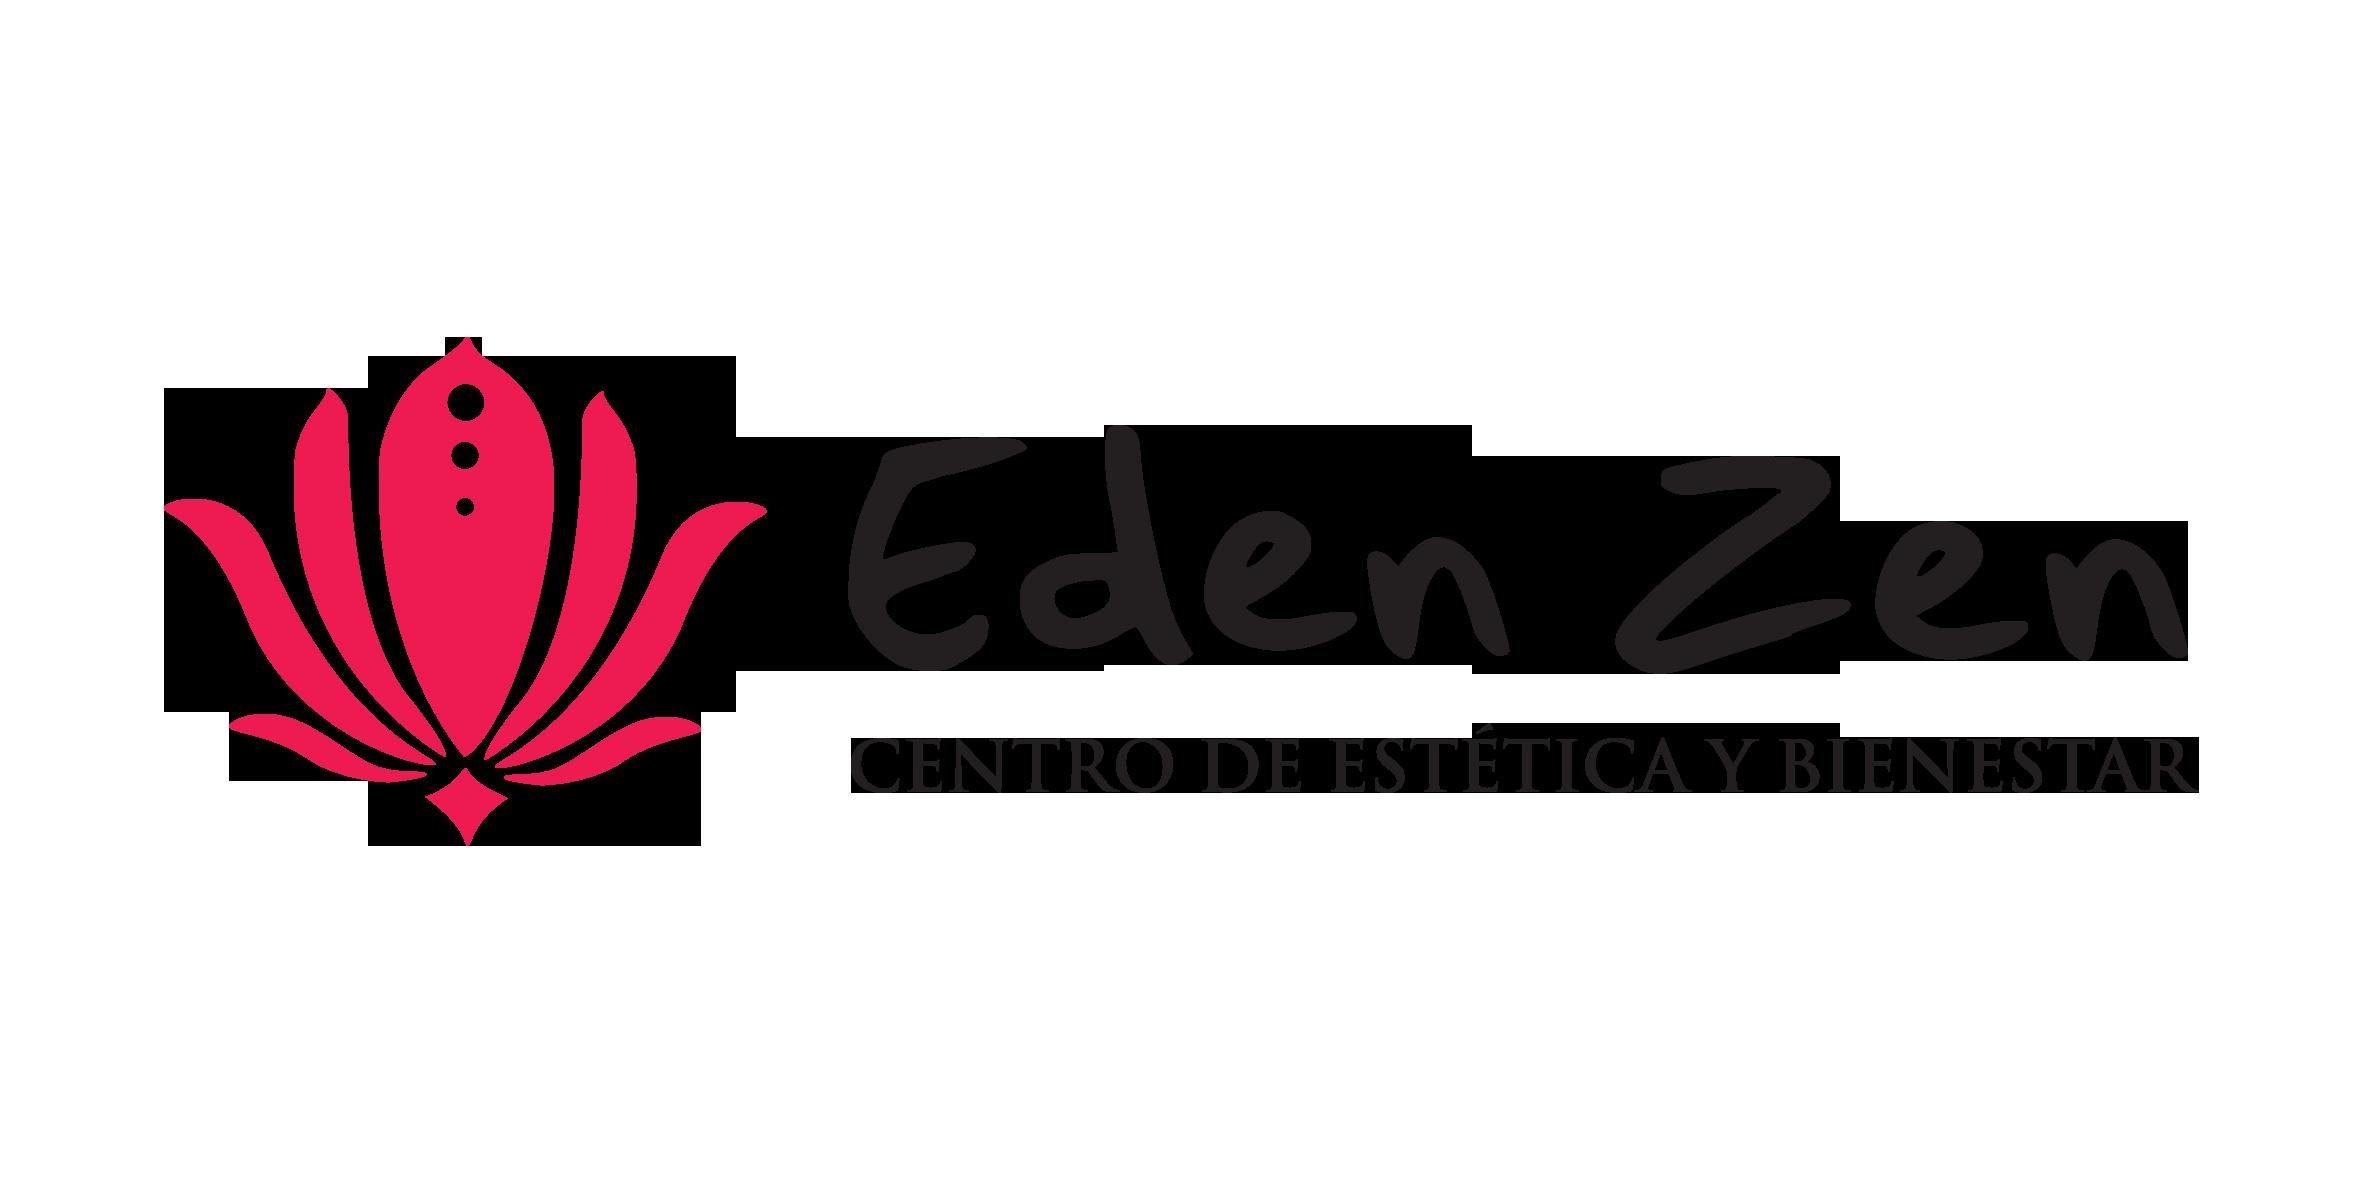 ▷ Centro de Masajes y Estética en Tetuán